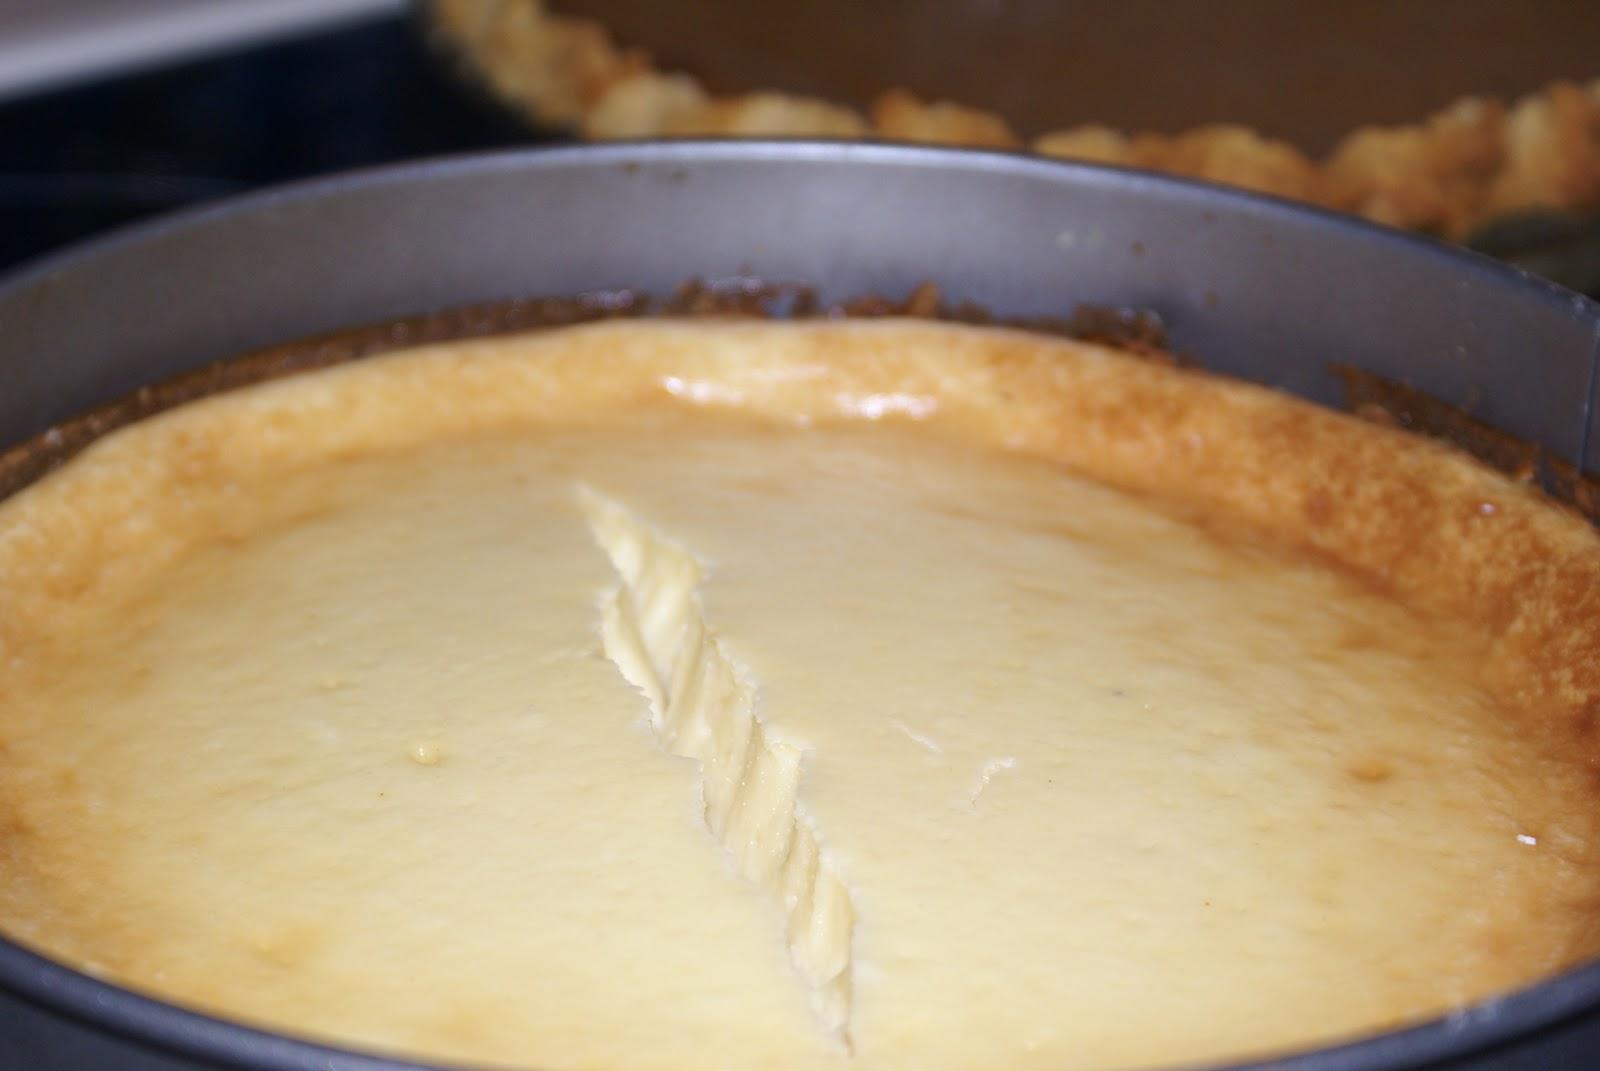 Billevesées: World's Best Recipe for Authentic New York Cheesecake